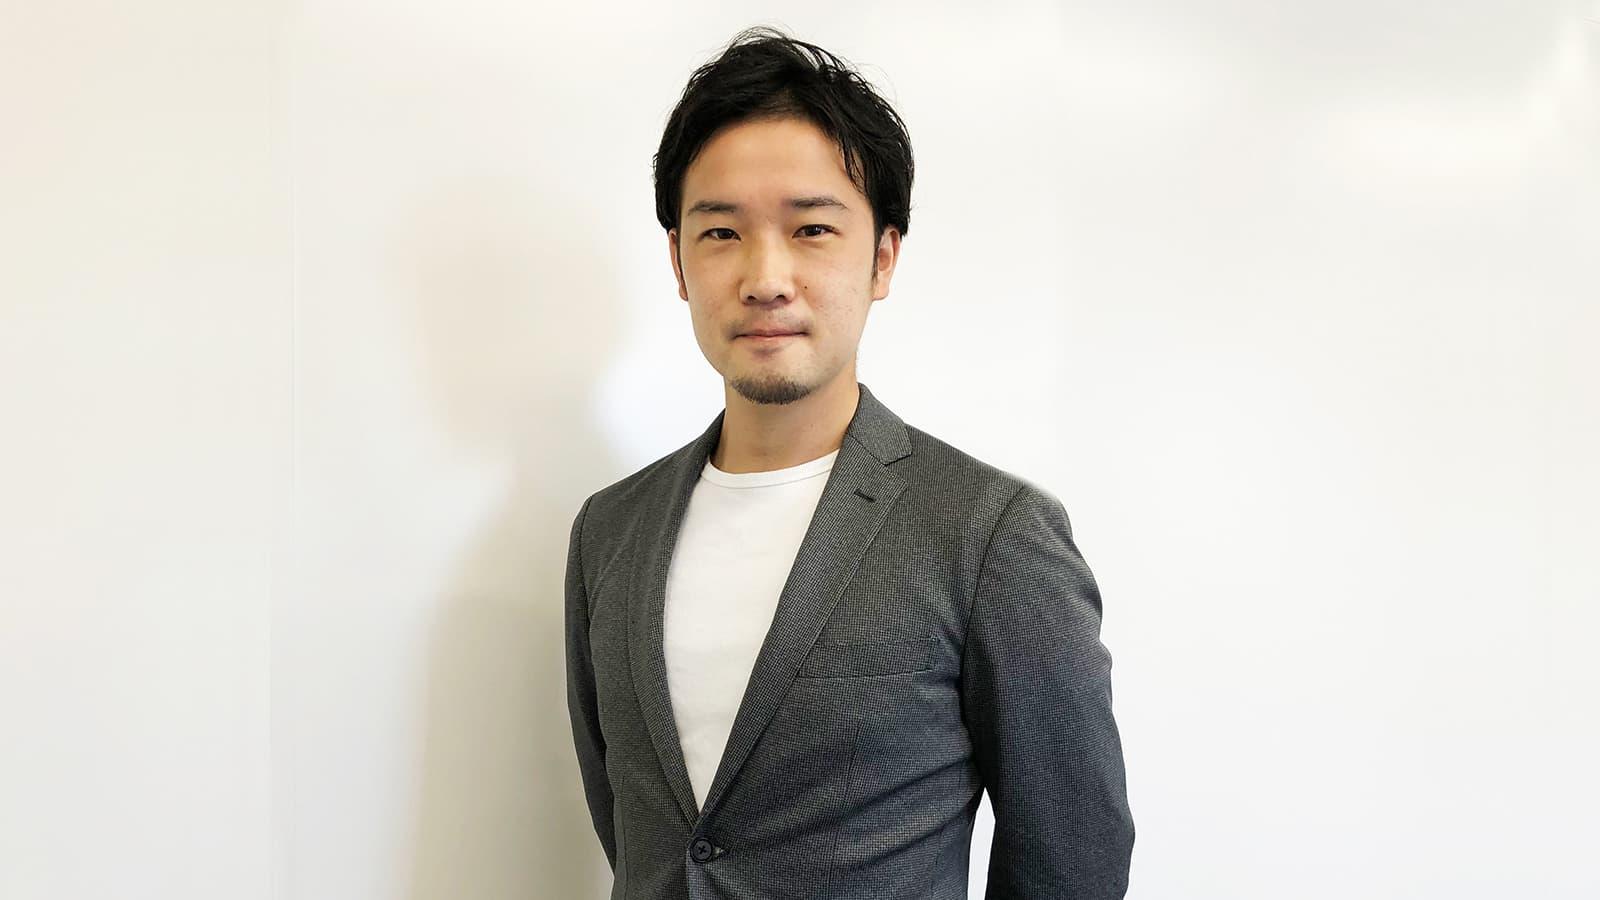 SOLTILO株式会社 代表取締役社長 大島 康経